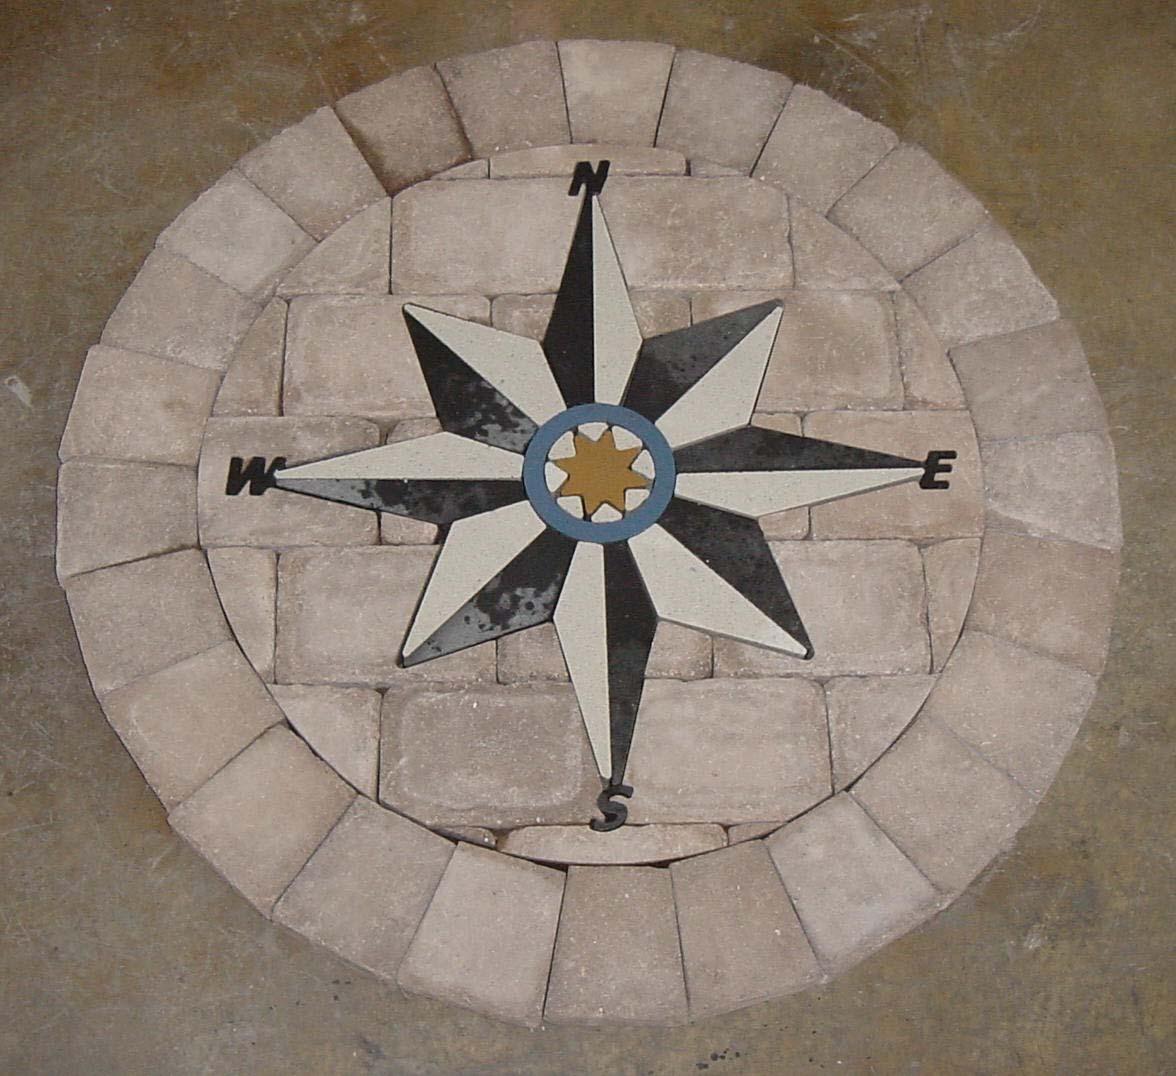 paverartcompass